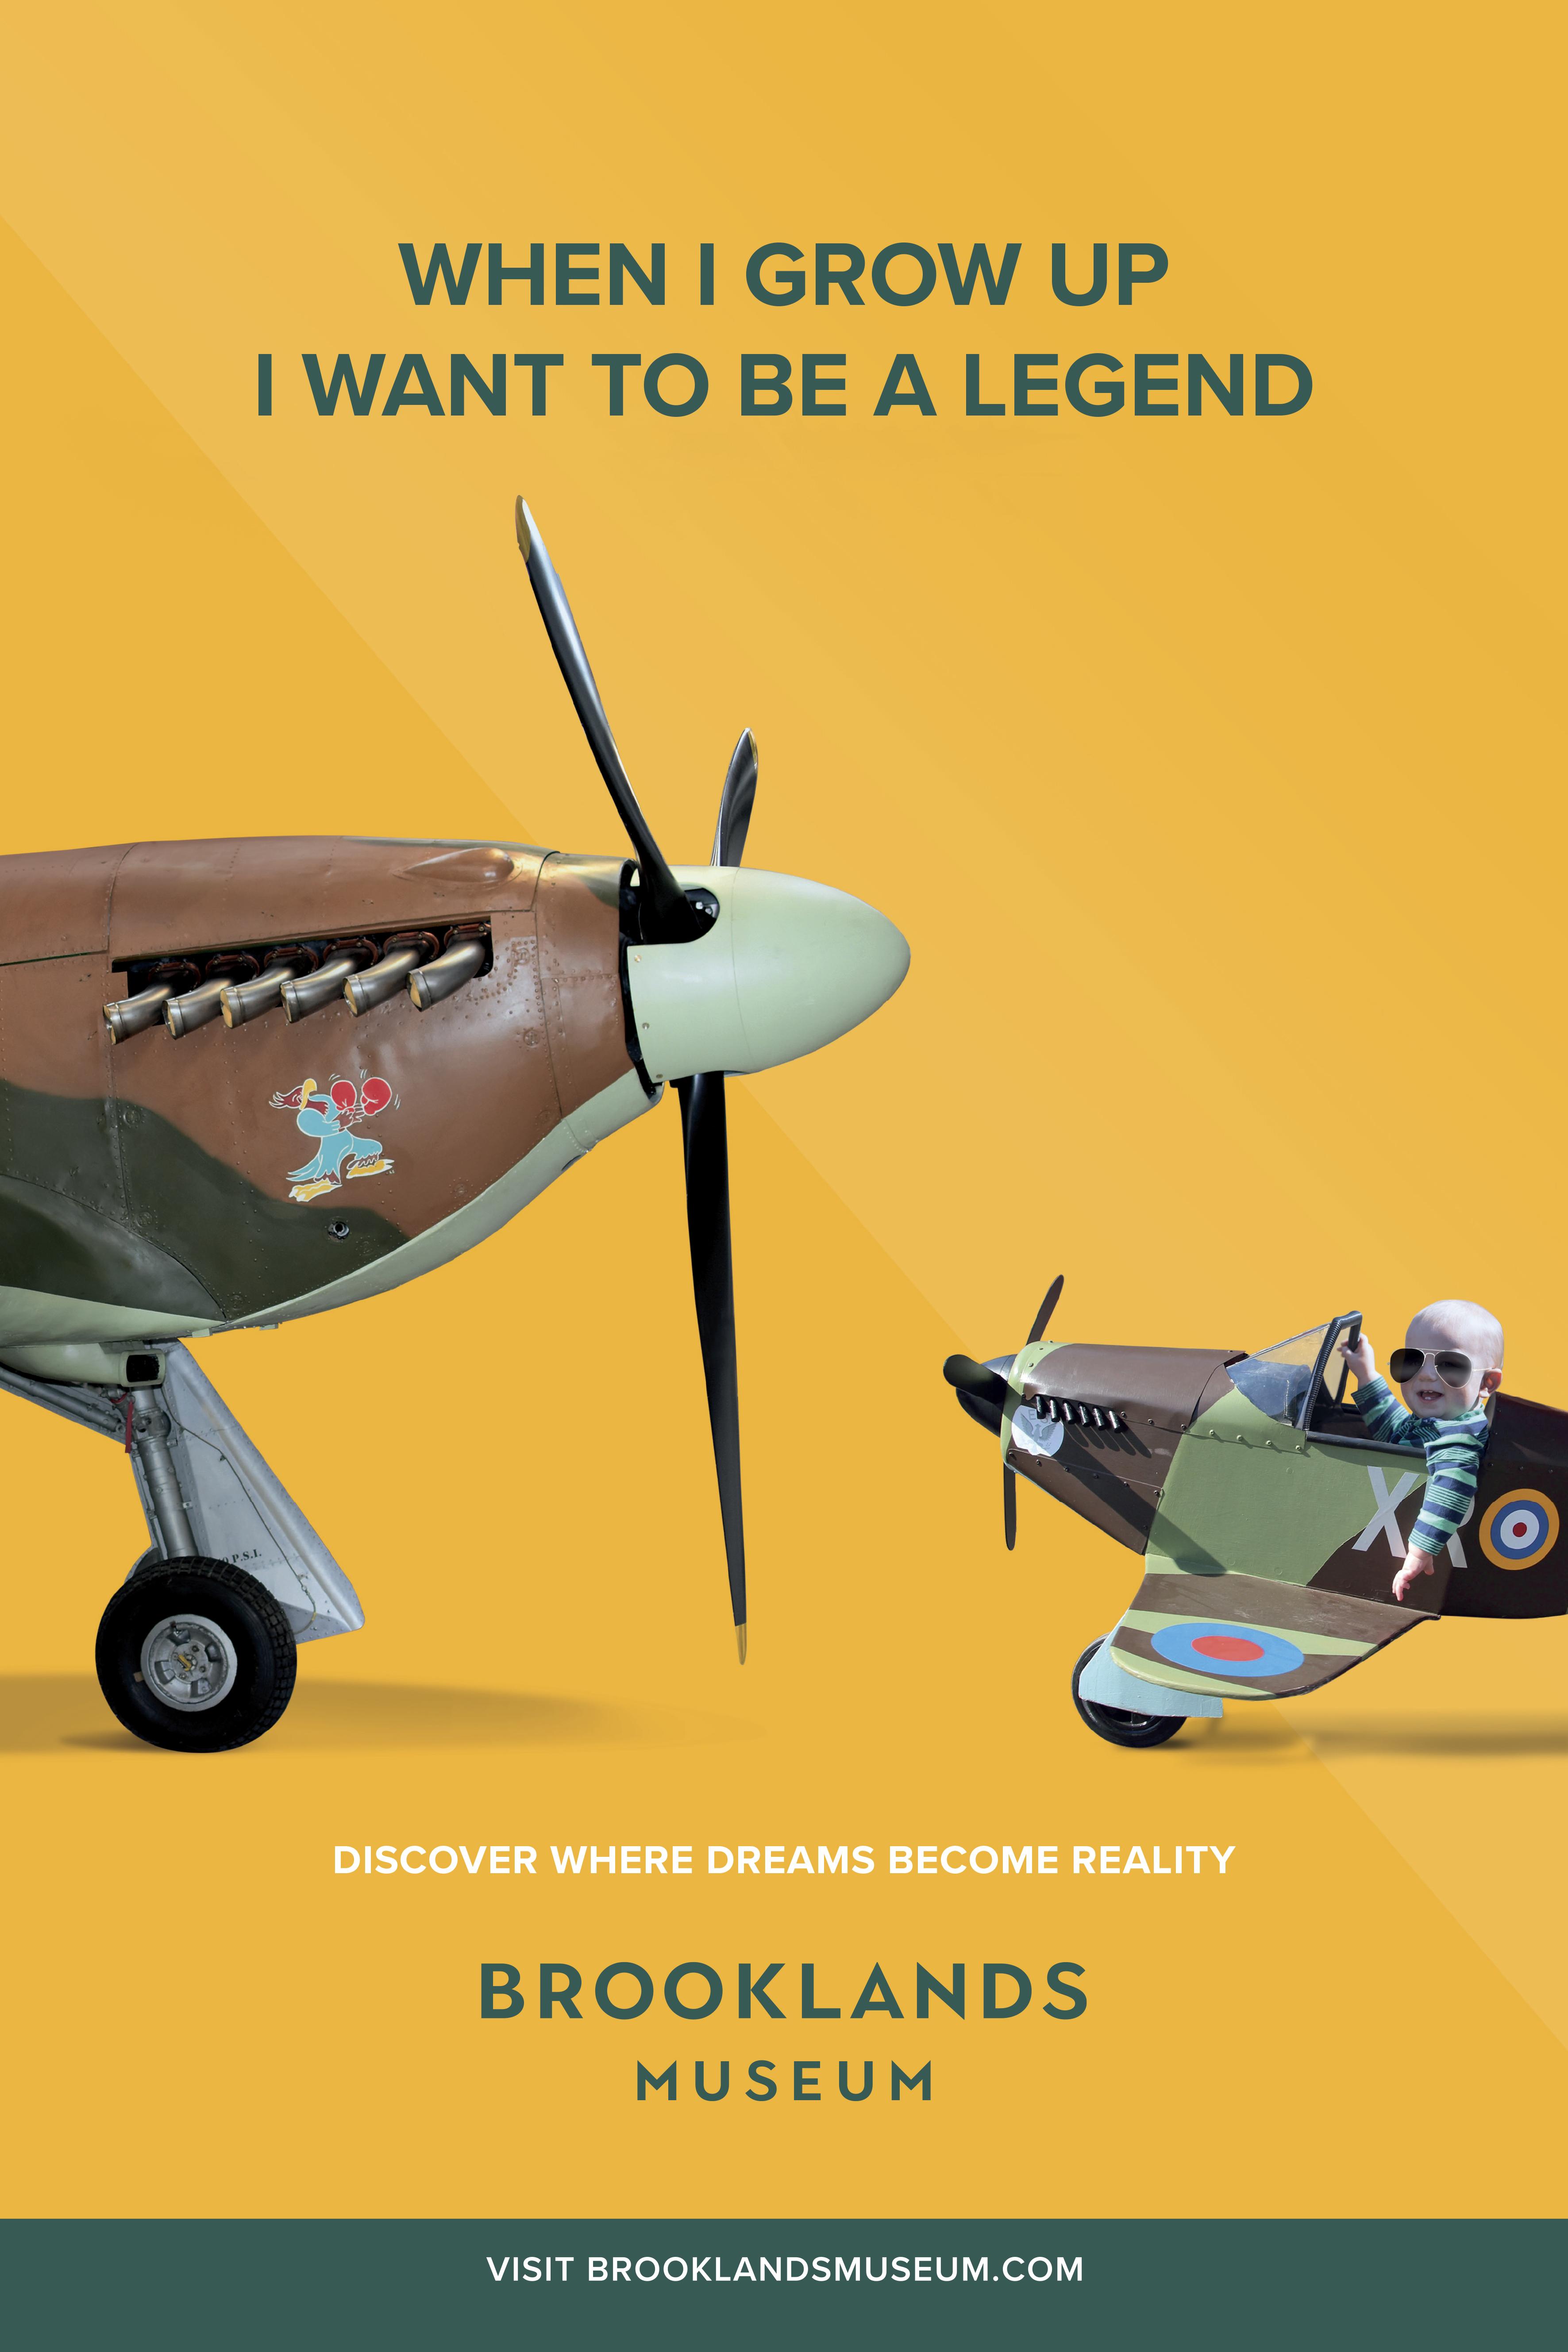 Brooklands brand campaign poster_6sht_350x440mm_v4_Hurricane